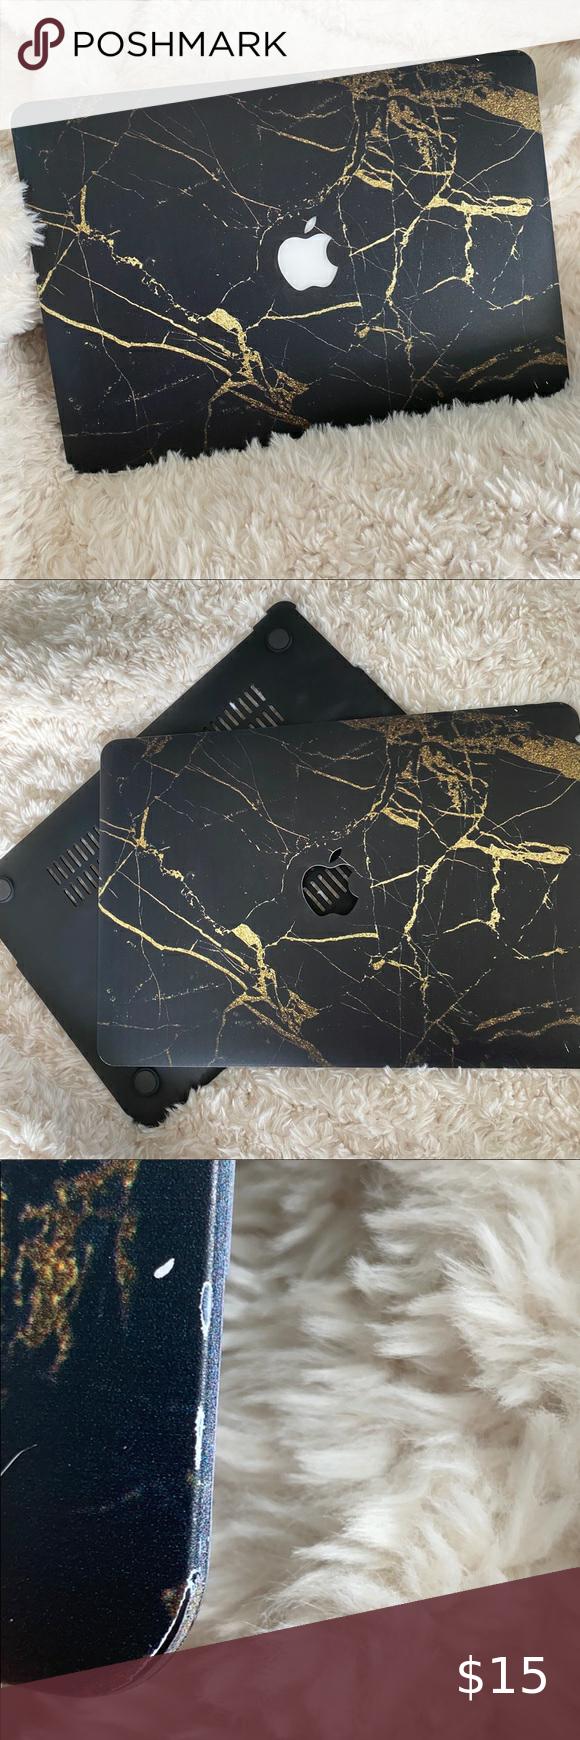 Macbook Air Hardshell Marble Cover in 2020 Macbook air